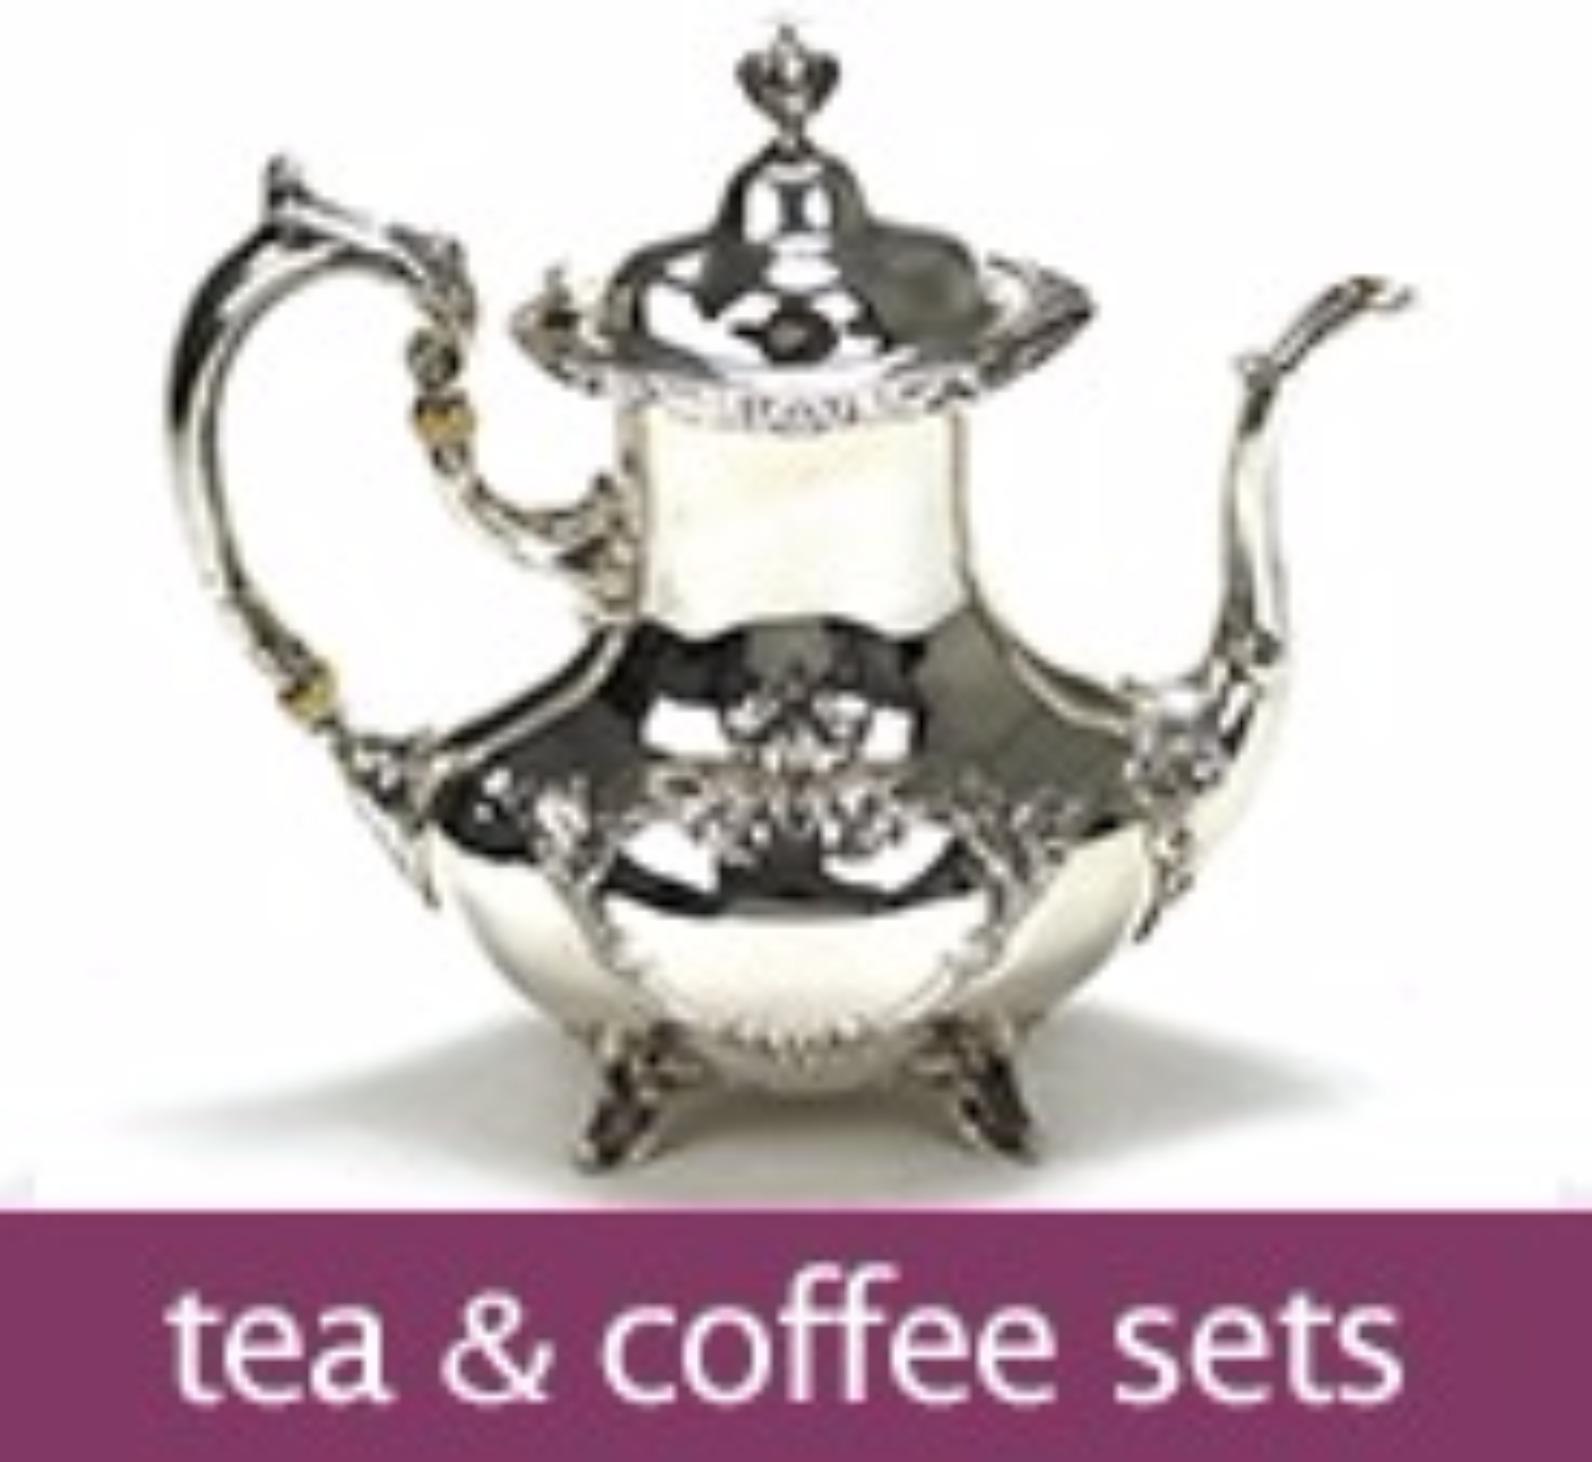 tea & coffee sets